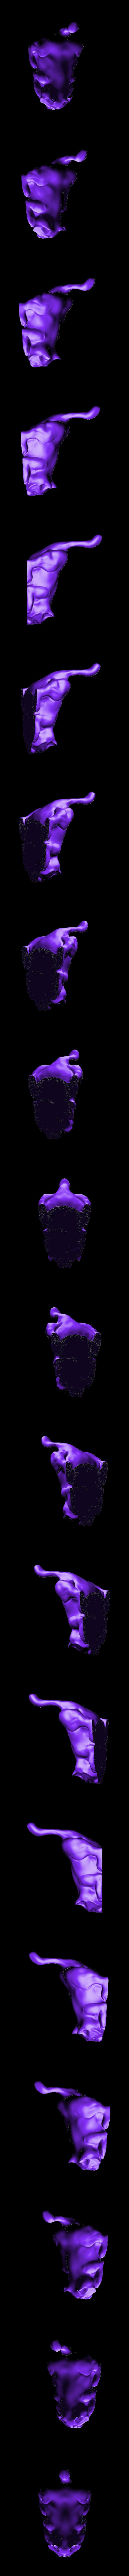 Pounce_cut.stl Download free STL file Pounce • 3D printable object, Thomllama